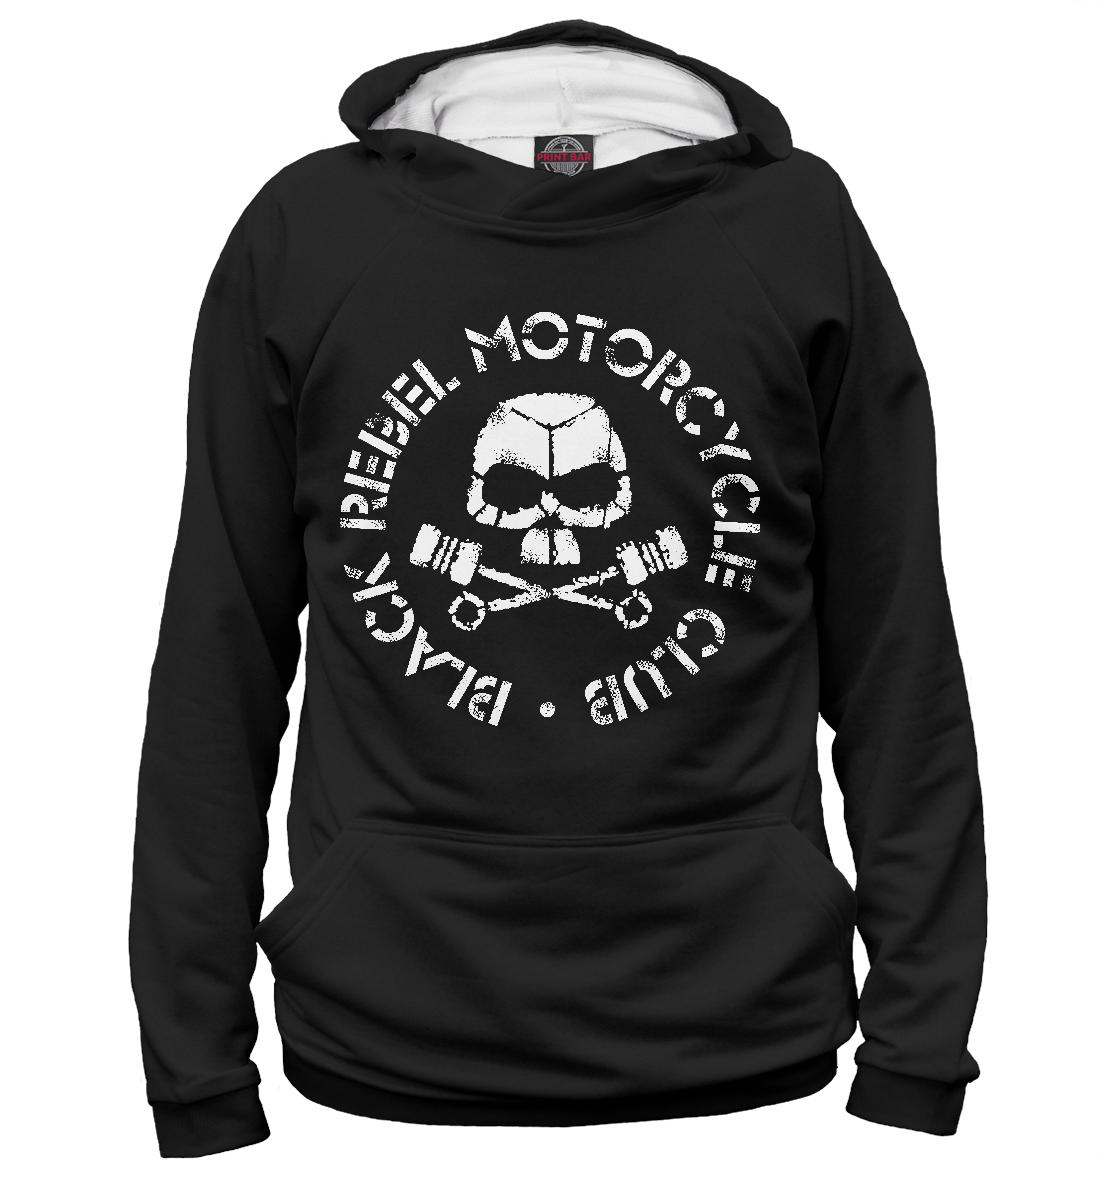 Купить Black Rebel Motorcycle Club, Printbar, Худи, MZK-895370-hud-2